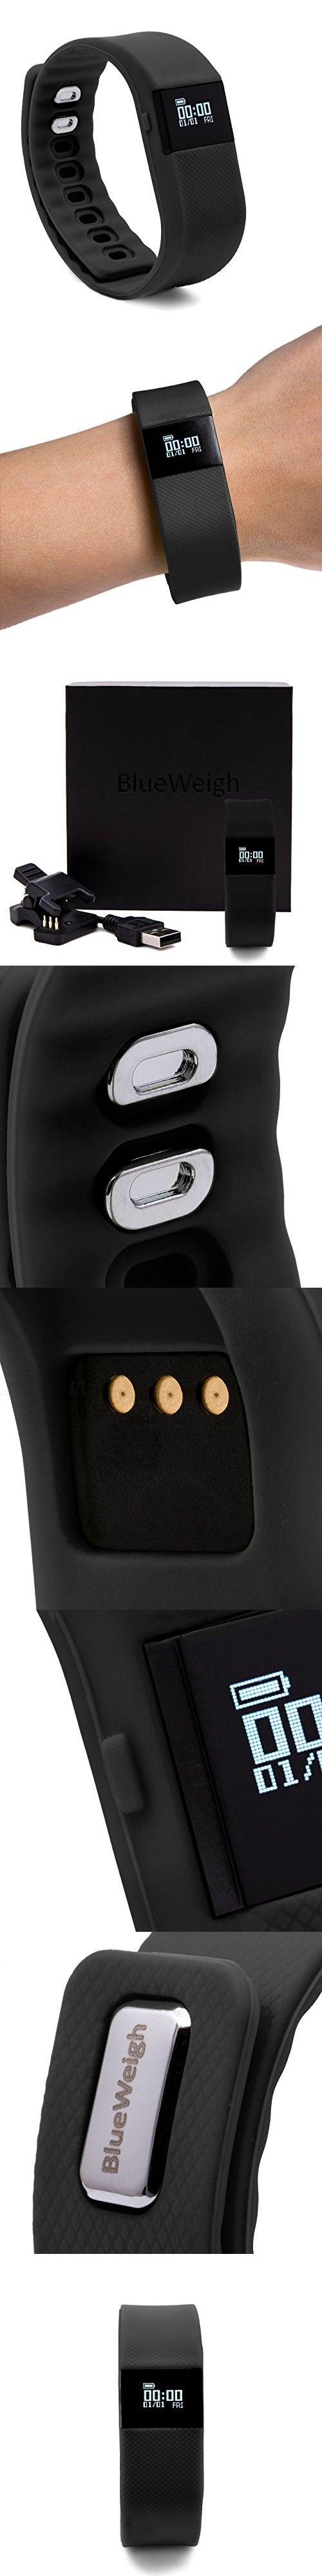 BLUEWEIGH Bluetooth 4.0 Fitness Activity Tracker, Wireless Activity Wristband - Pedometer, Black